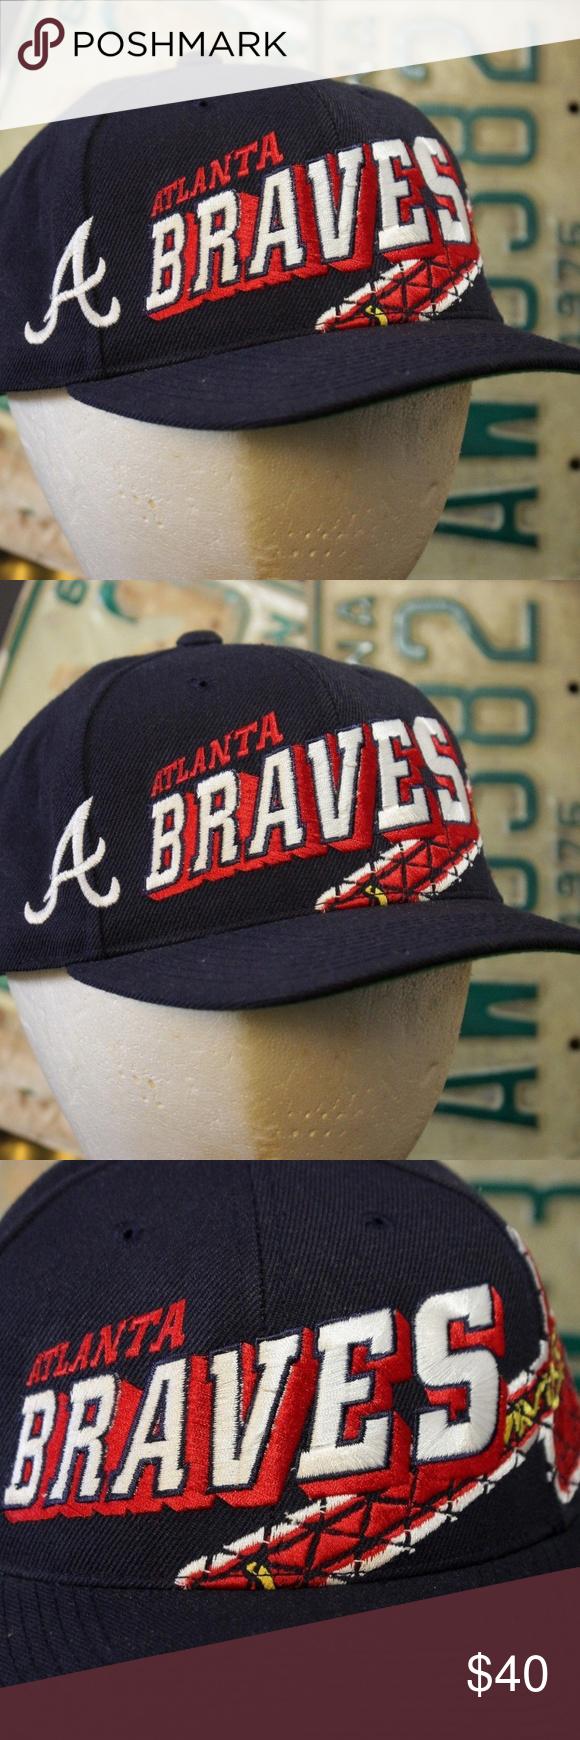 Vintage Atlanta Braves Snapback Hat Baseball Cap Up For Purchase Is A Vintage Atlanta Braves Large Logo Snapback Hat Snapback Hats Baseball Hats Atlanta Braves